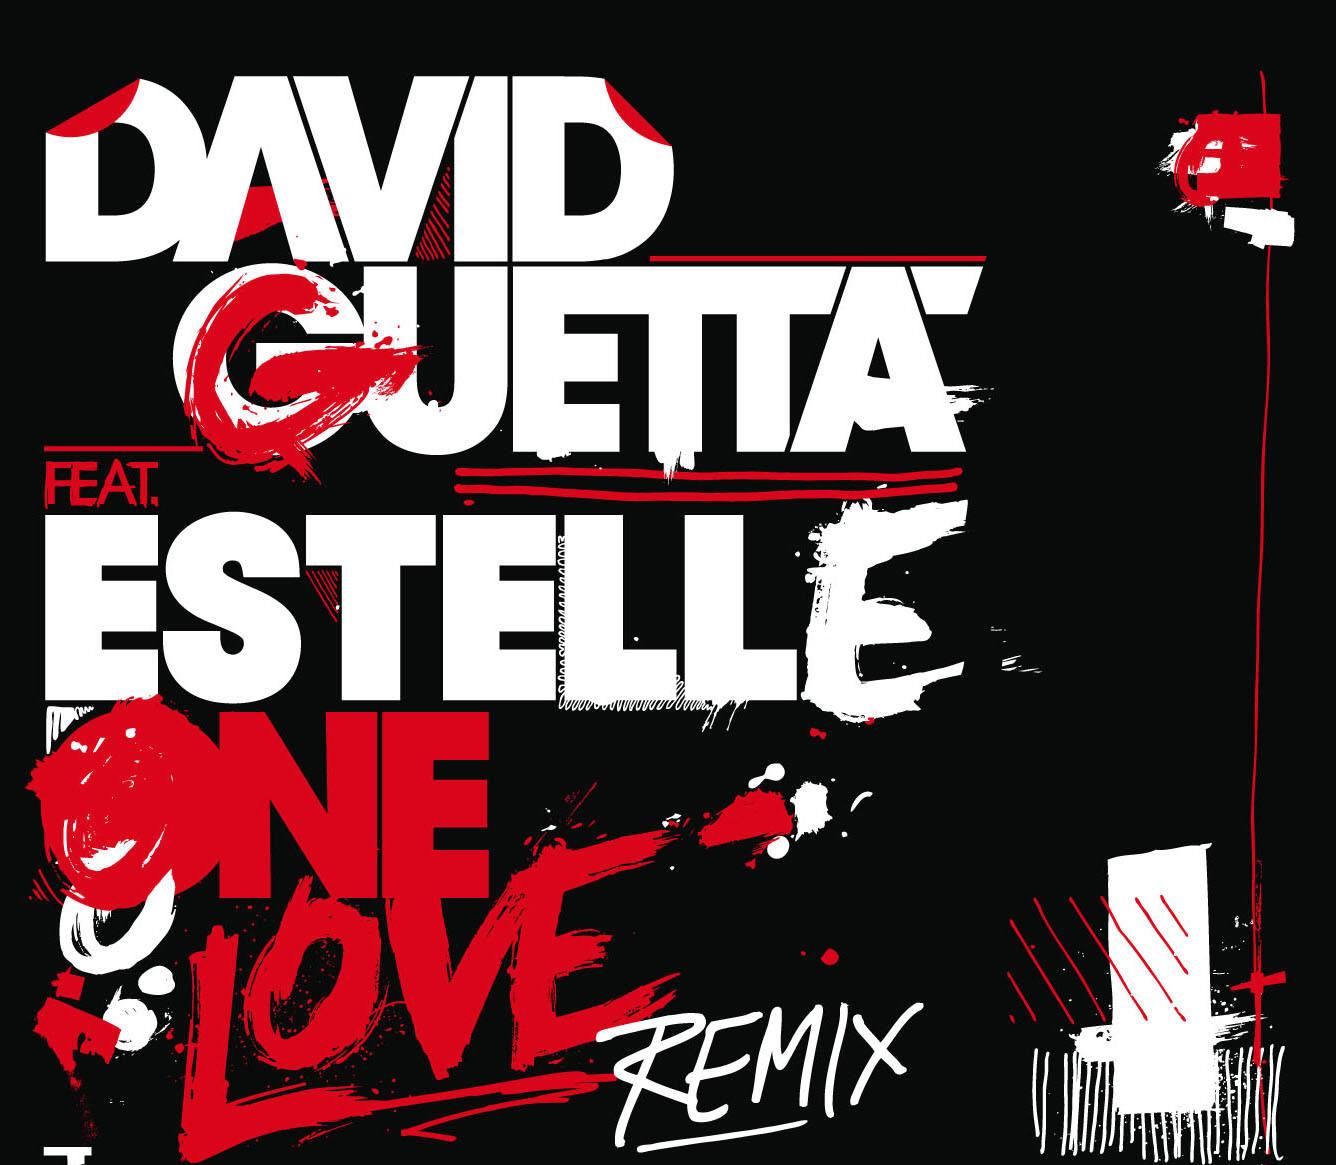 ultratop be - David Guetta feat  Estelle - One Love